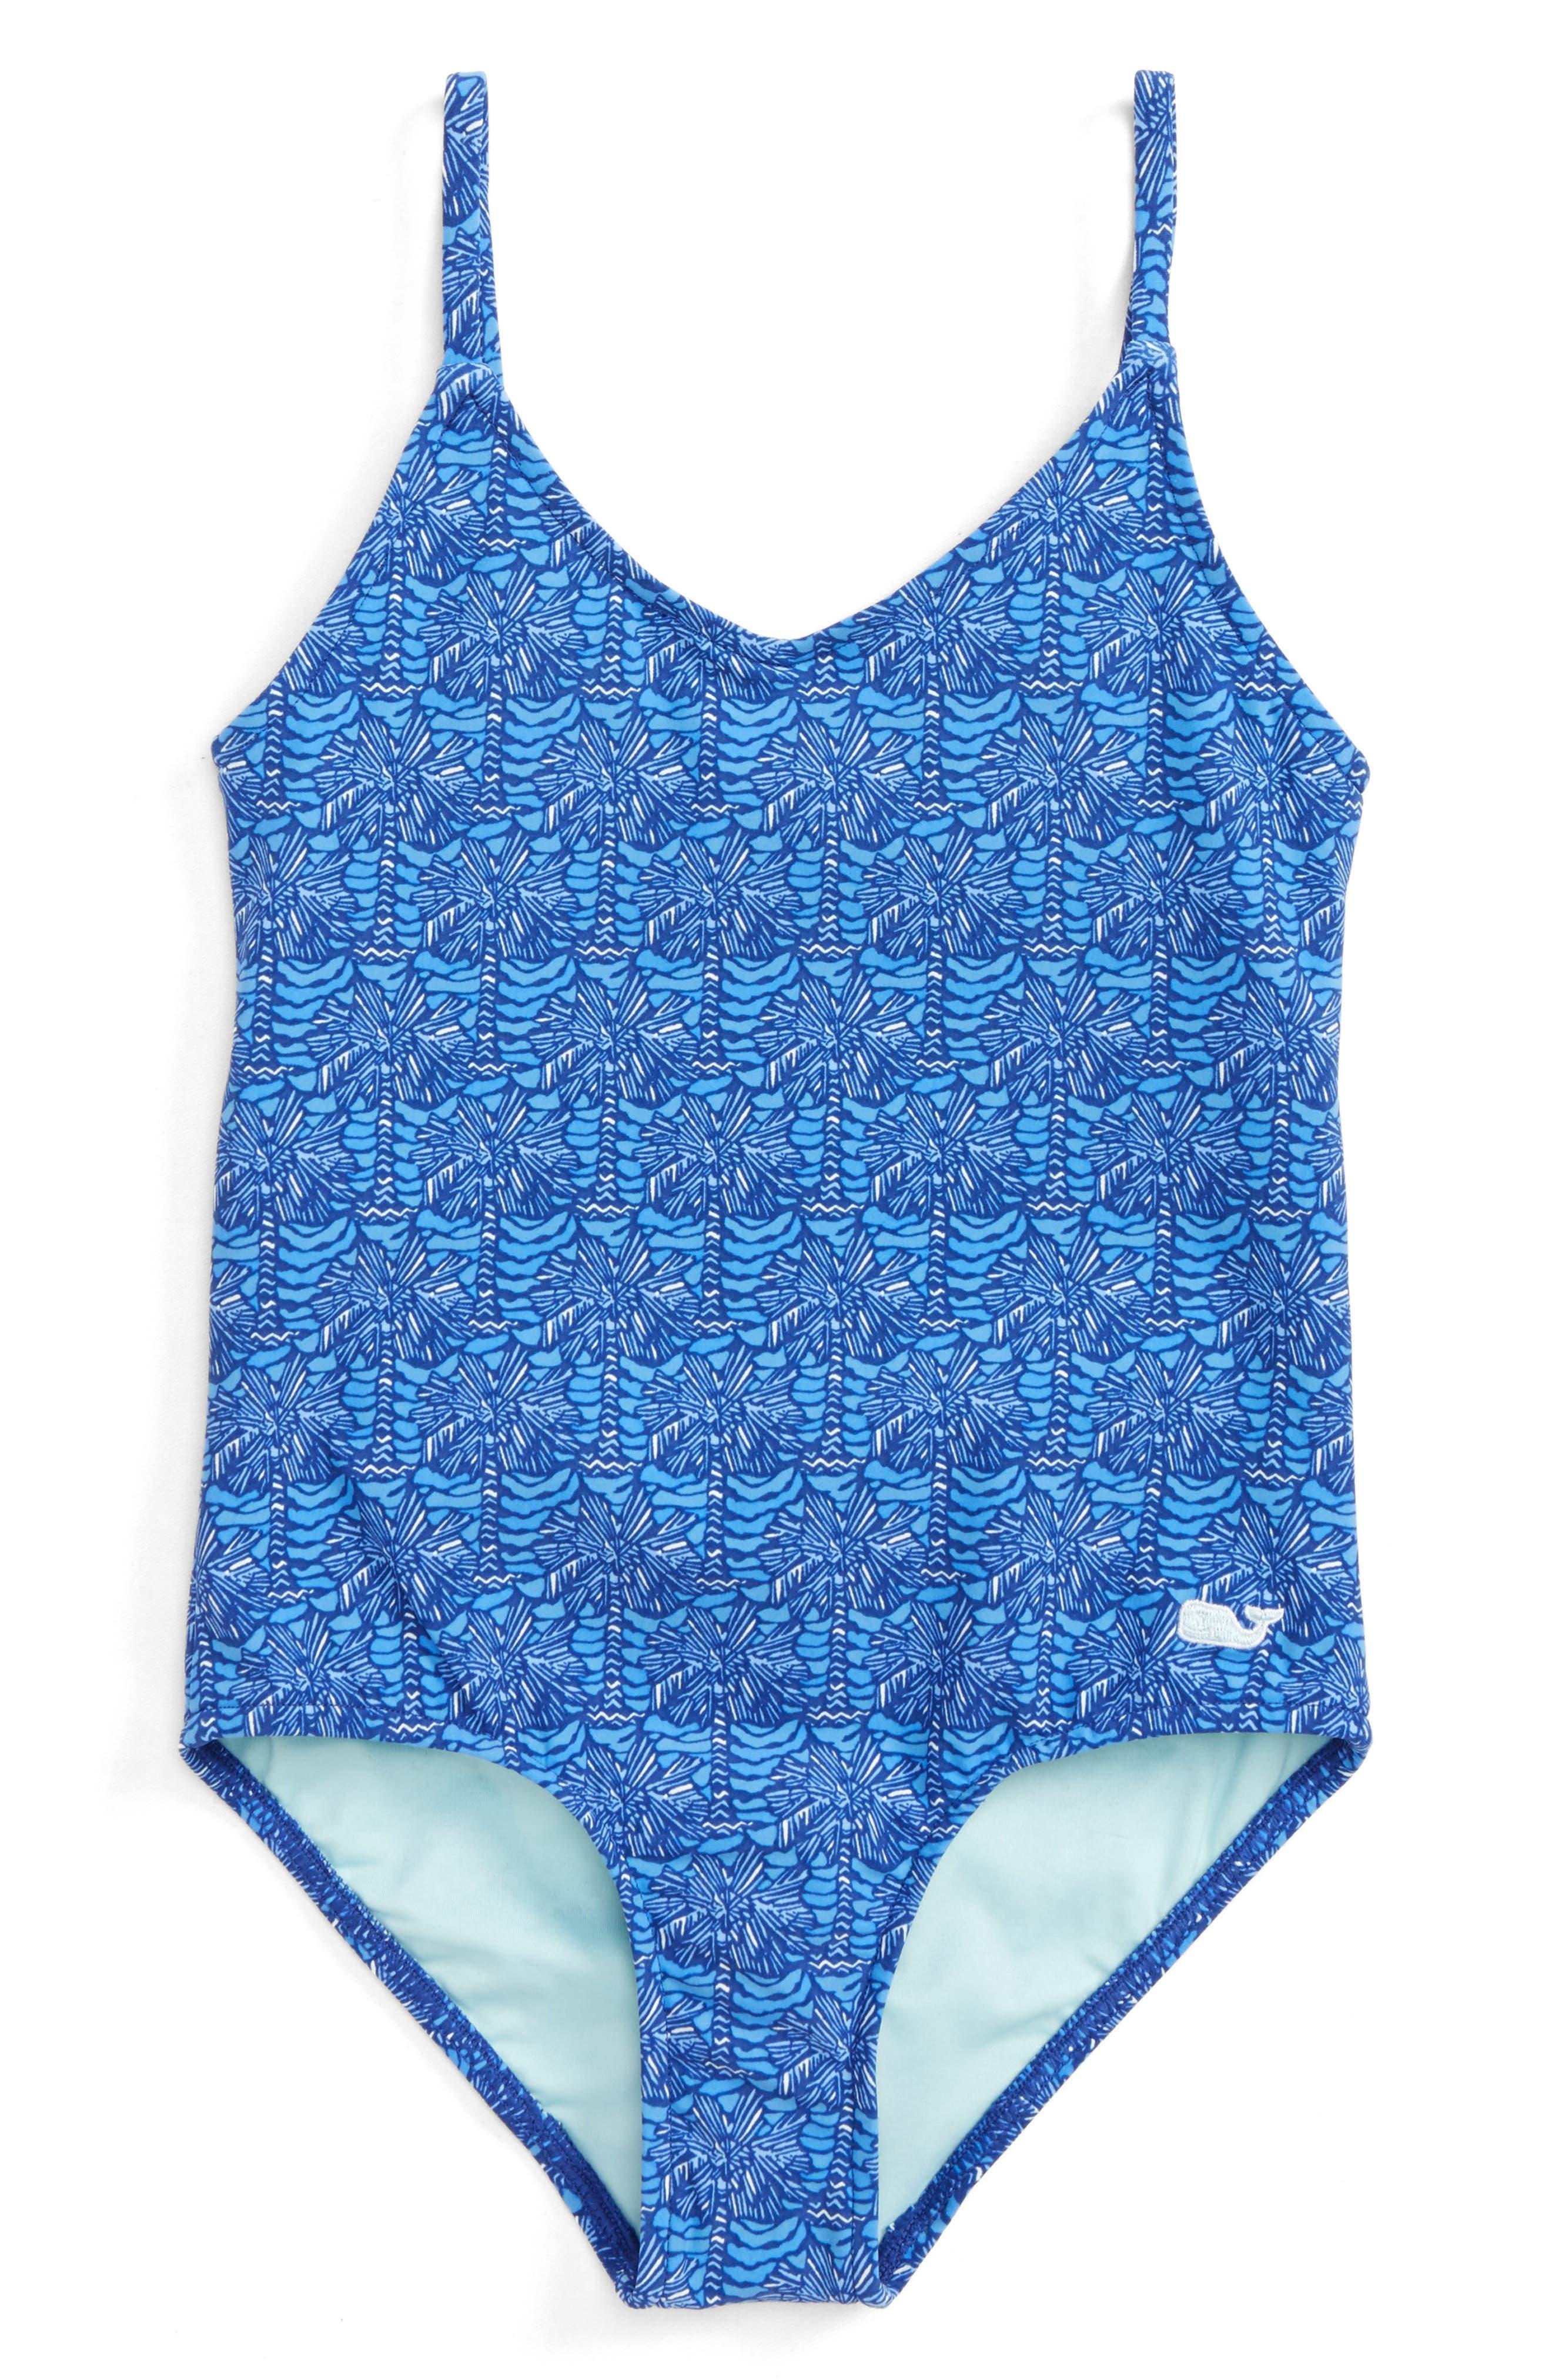 Main Image - vineyard vines Palmetto Print One-Piece Swimsuit (Toddler Girls)